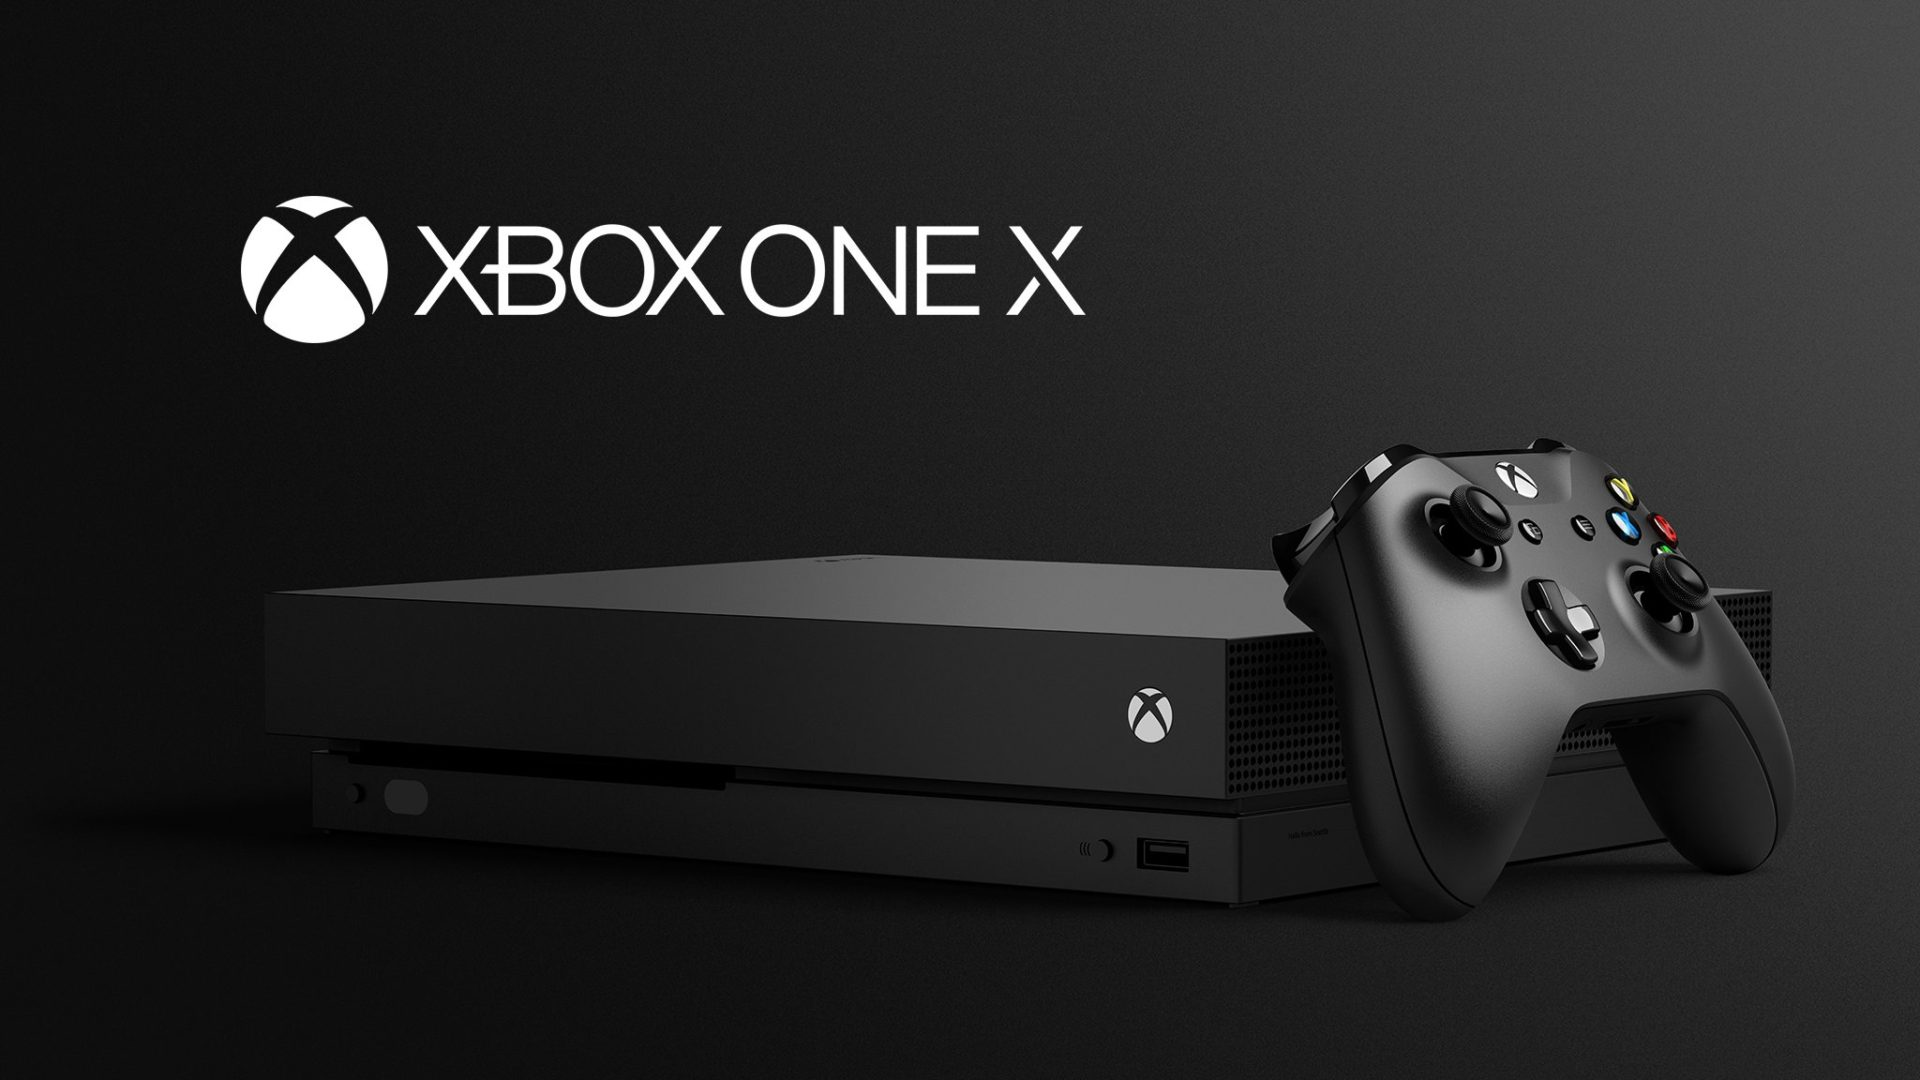 Xbox One X what's inside